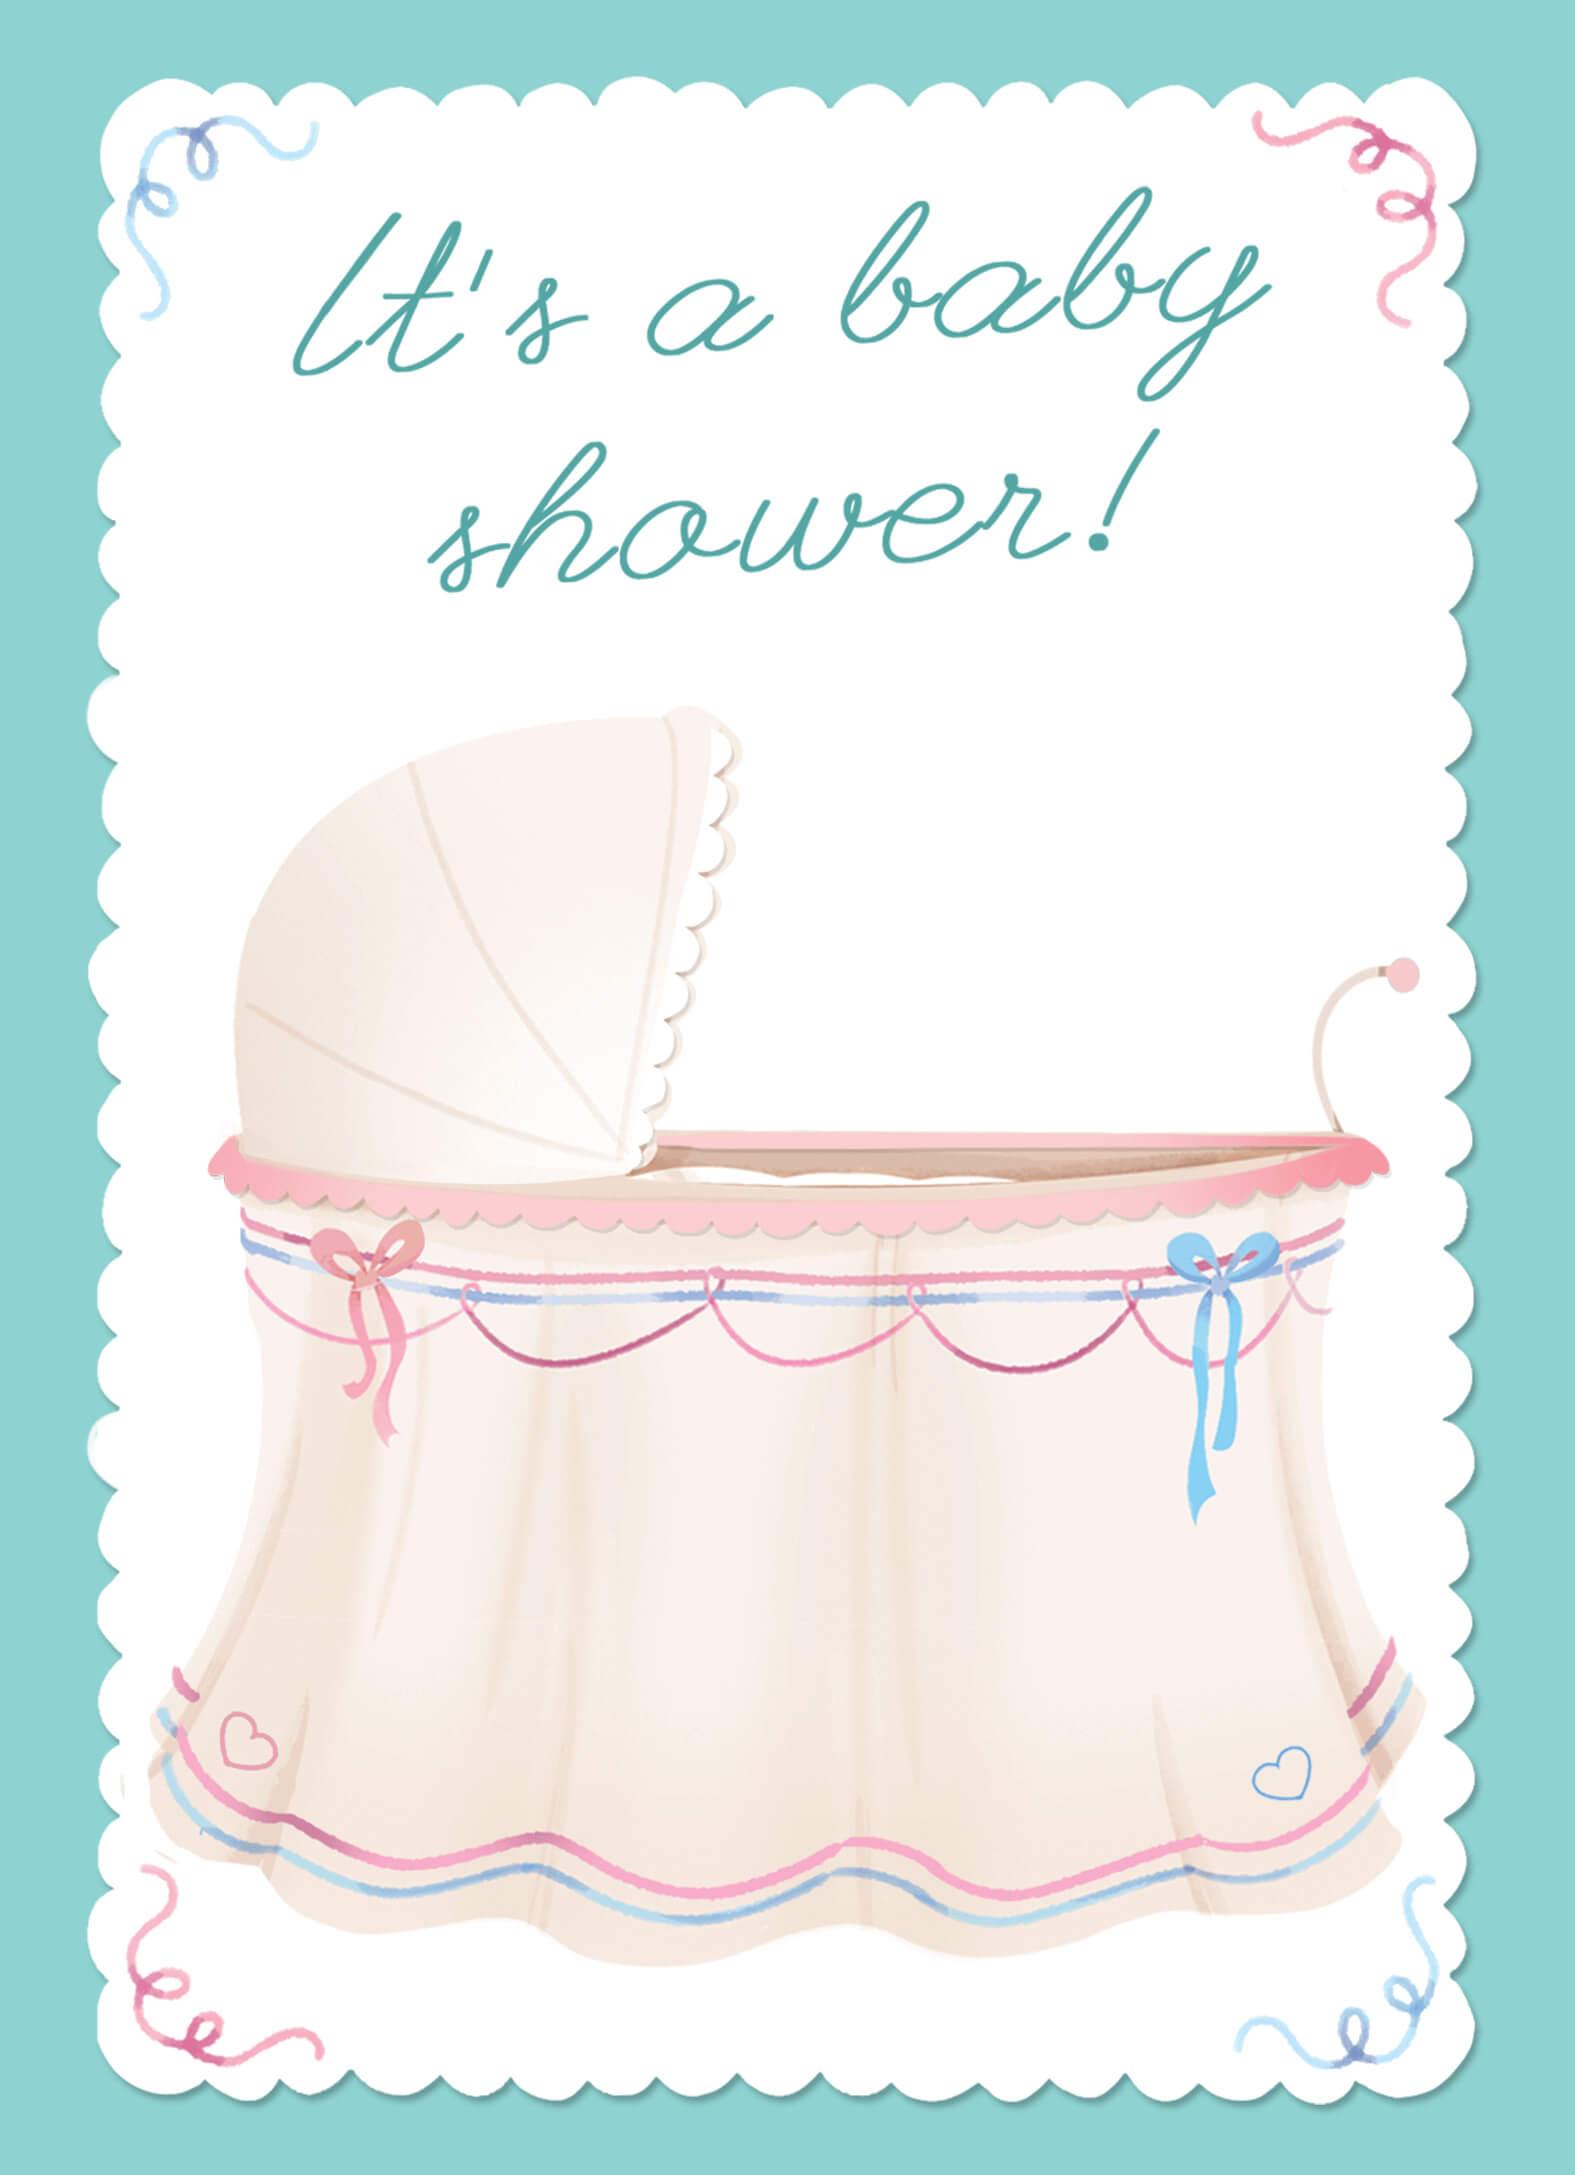 Bundle Of Joy - Baby Shower Invitation Template (Free in Free Baby Shower Invitation Templates Microsoft Word